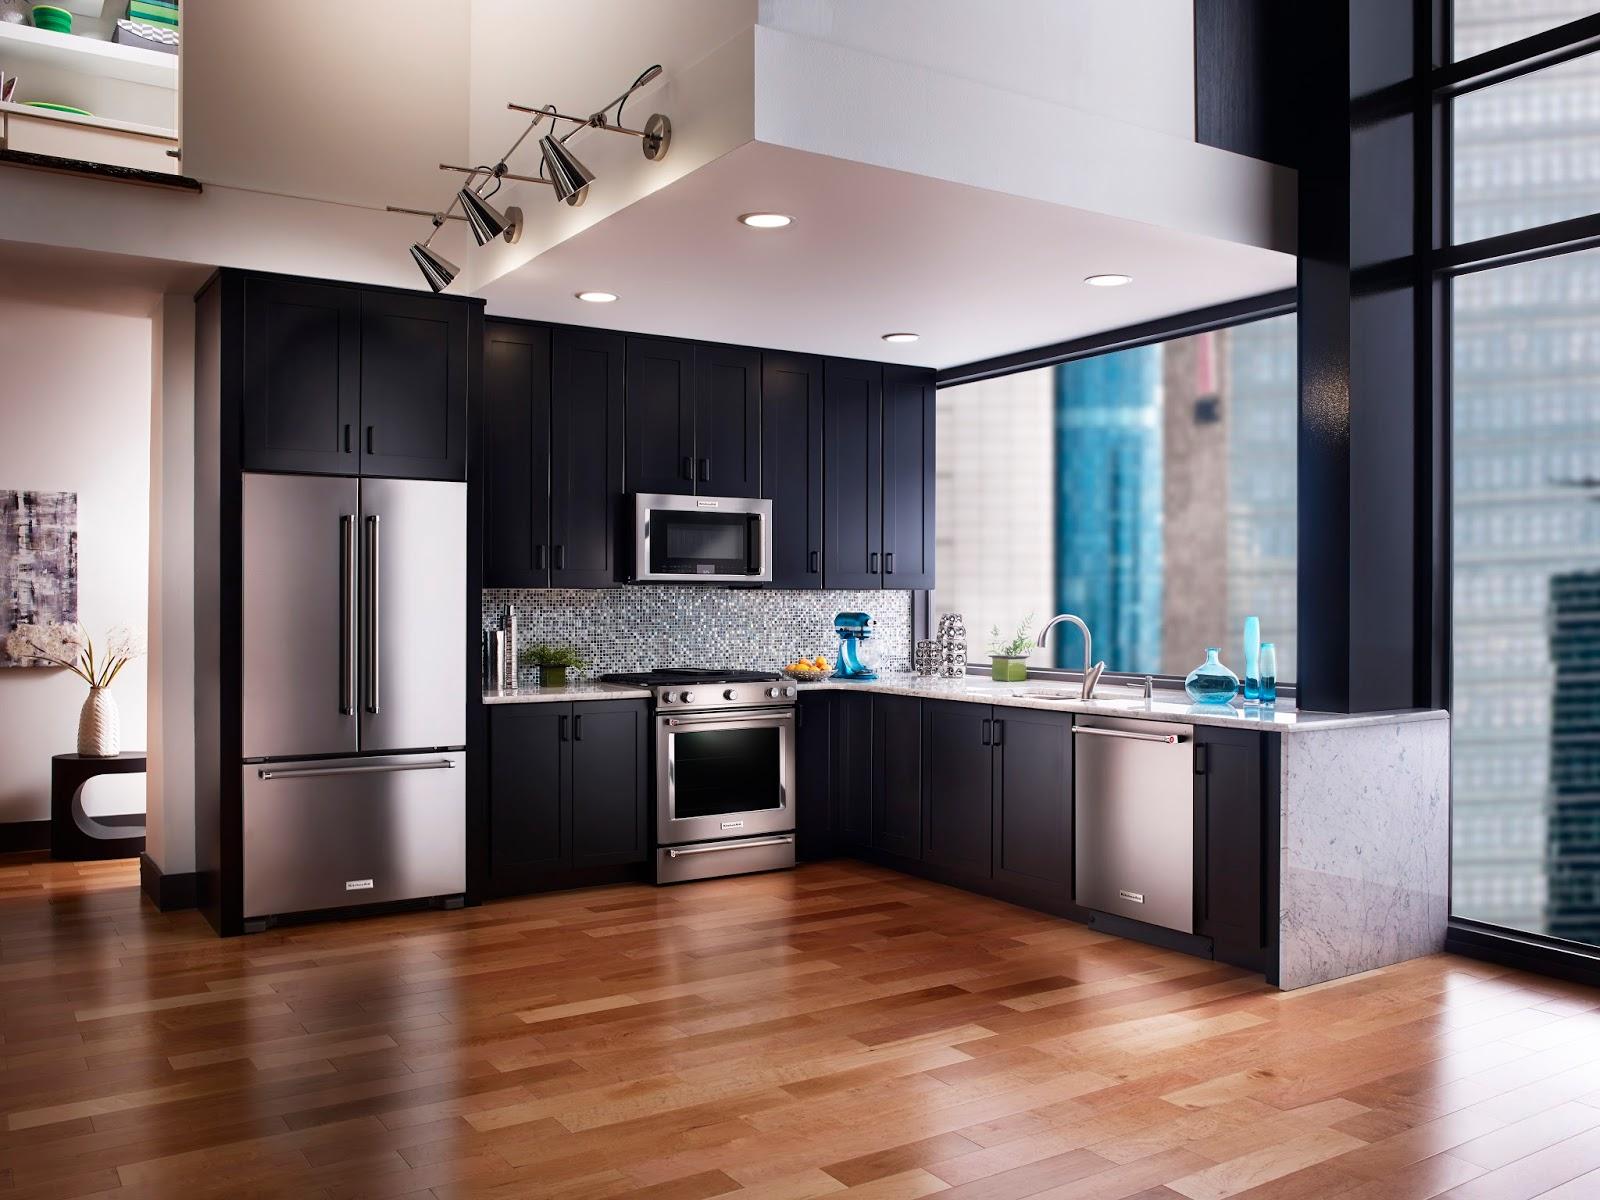 Transforming My Kitchen with Best Buy KitchenAid Appliances